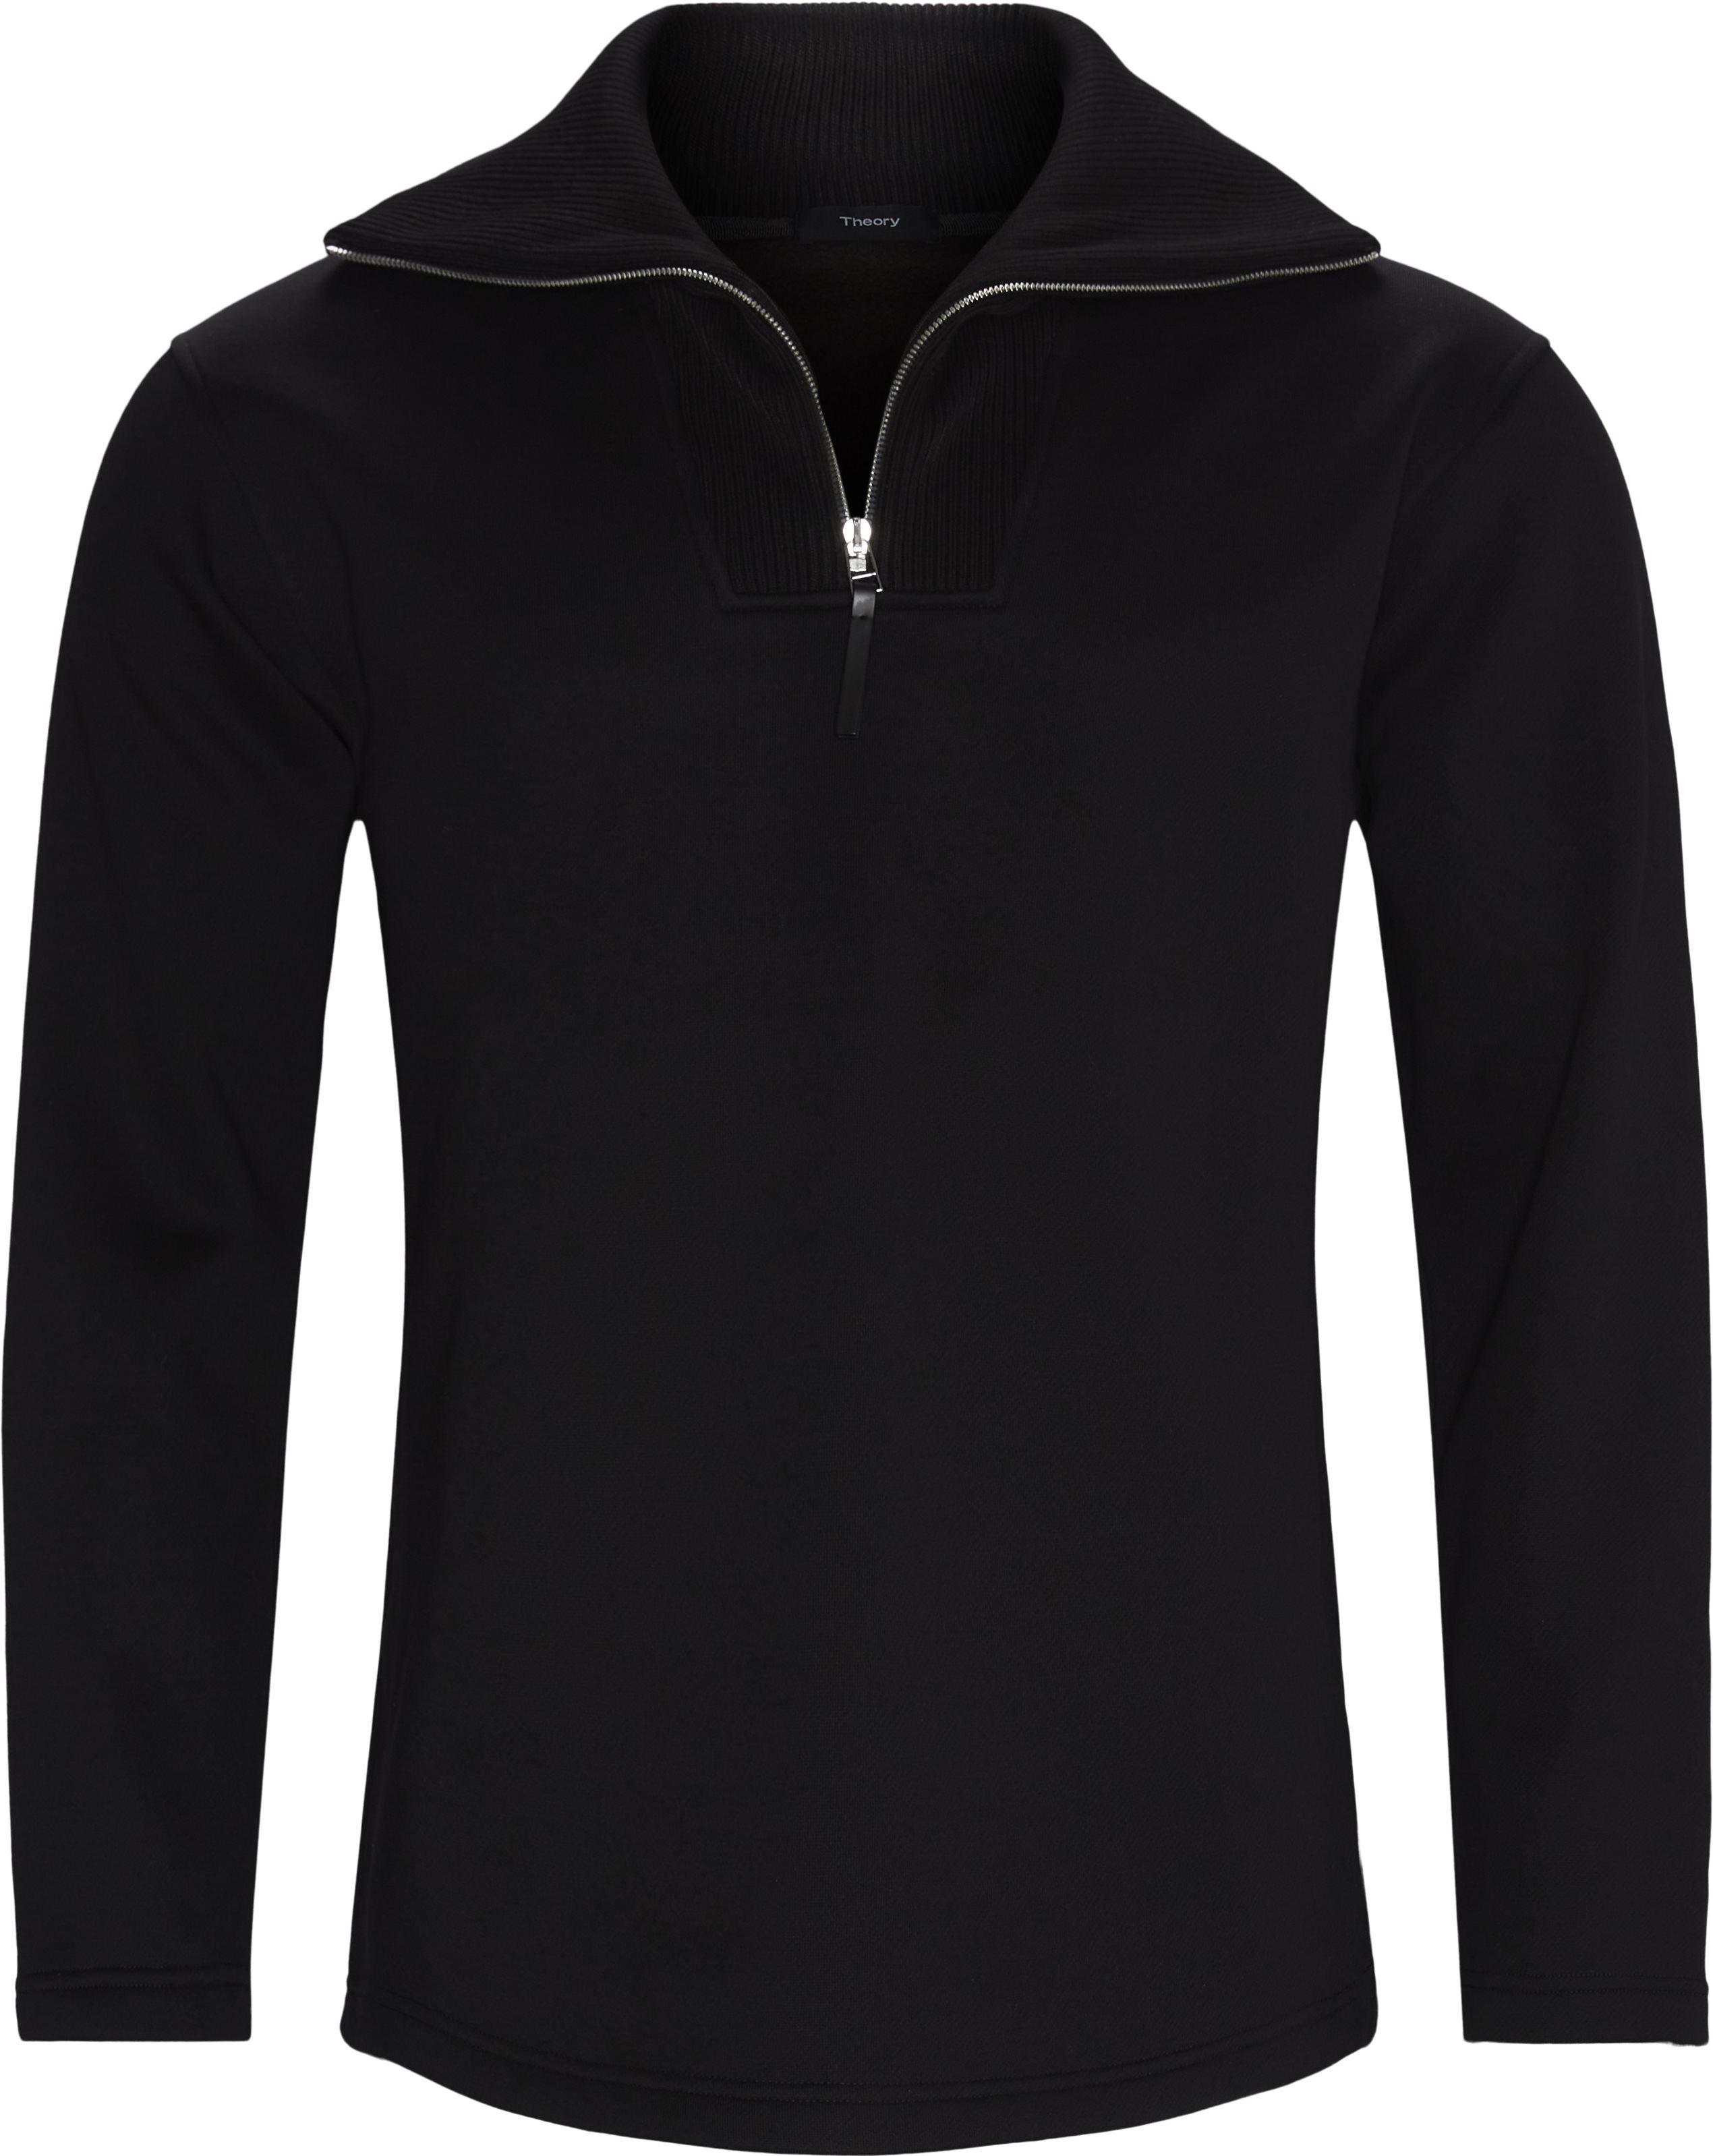 Camner Sweatshirt - Strik - Regular fit - Sort